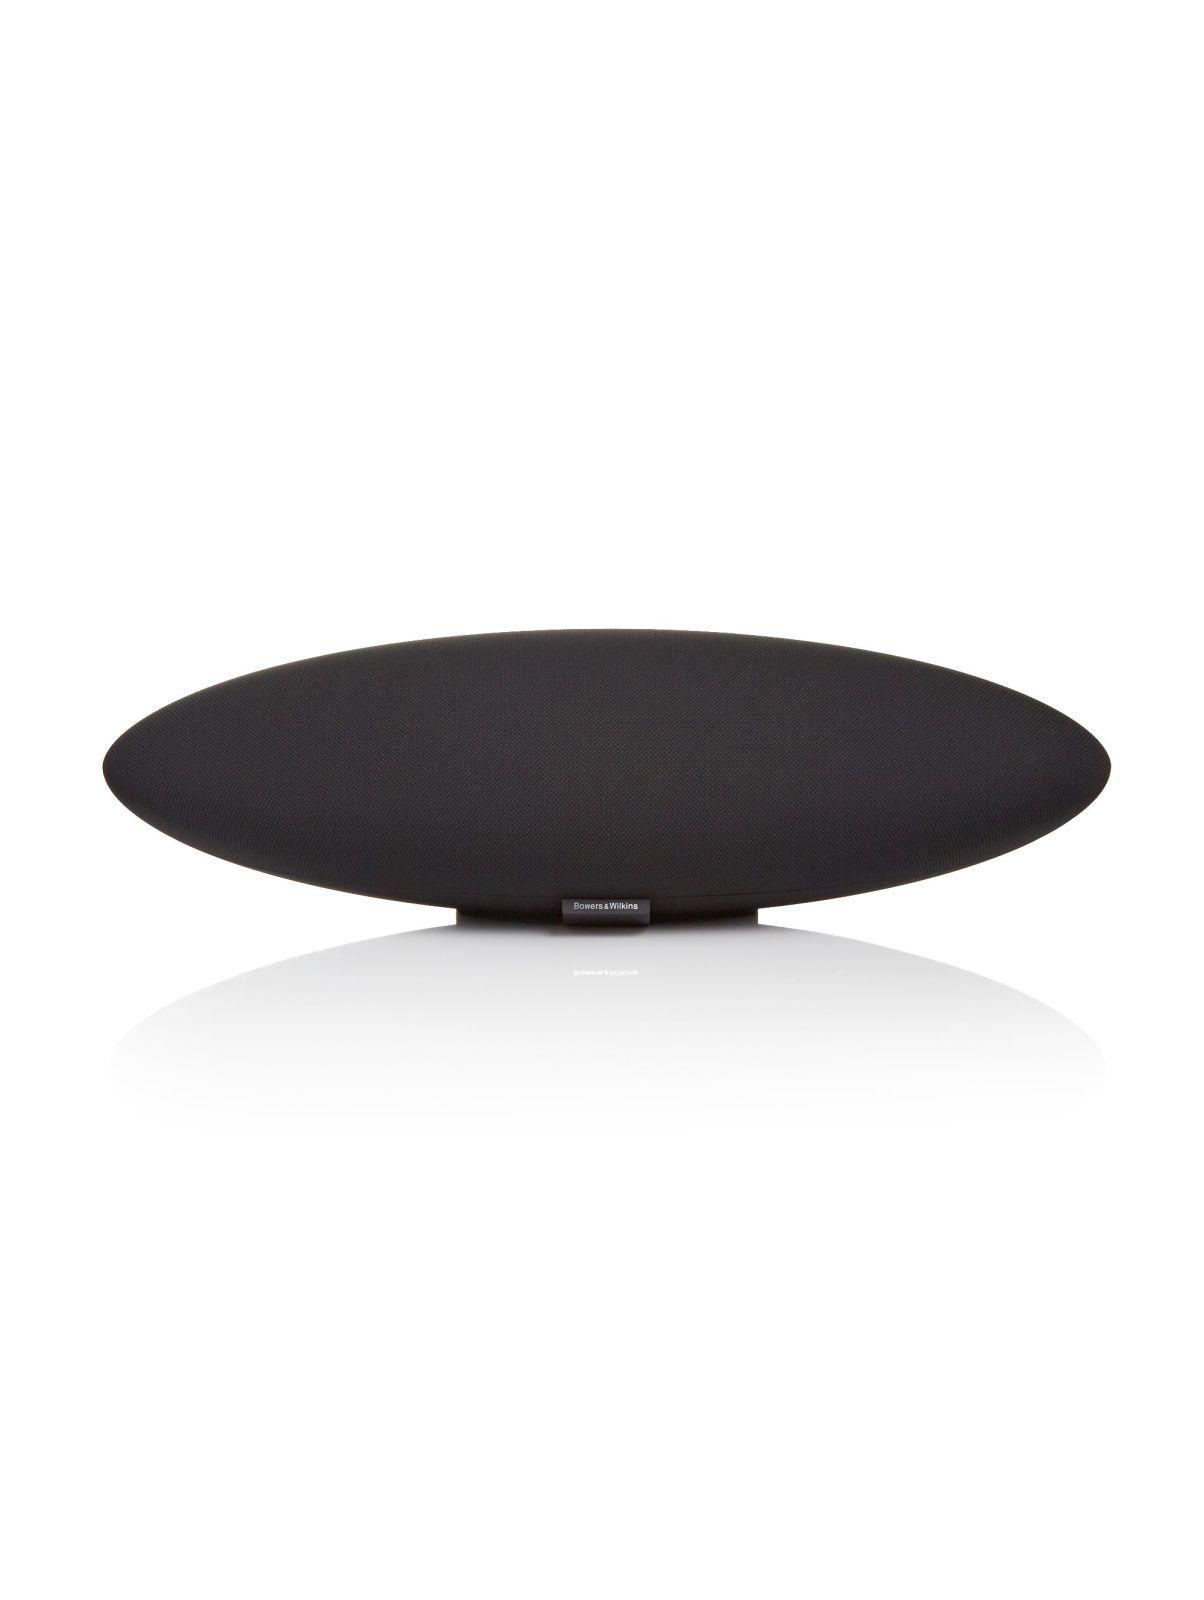 Bluetooth Lautsprecher Zeppelin Jetzt bestellen unter: https ...